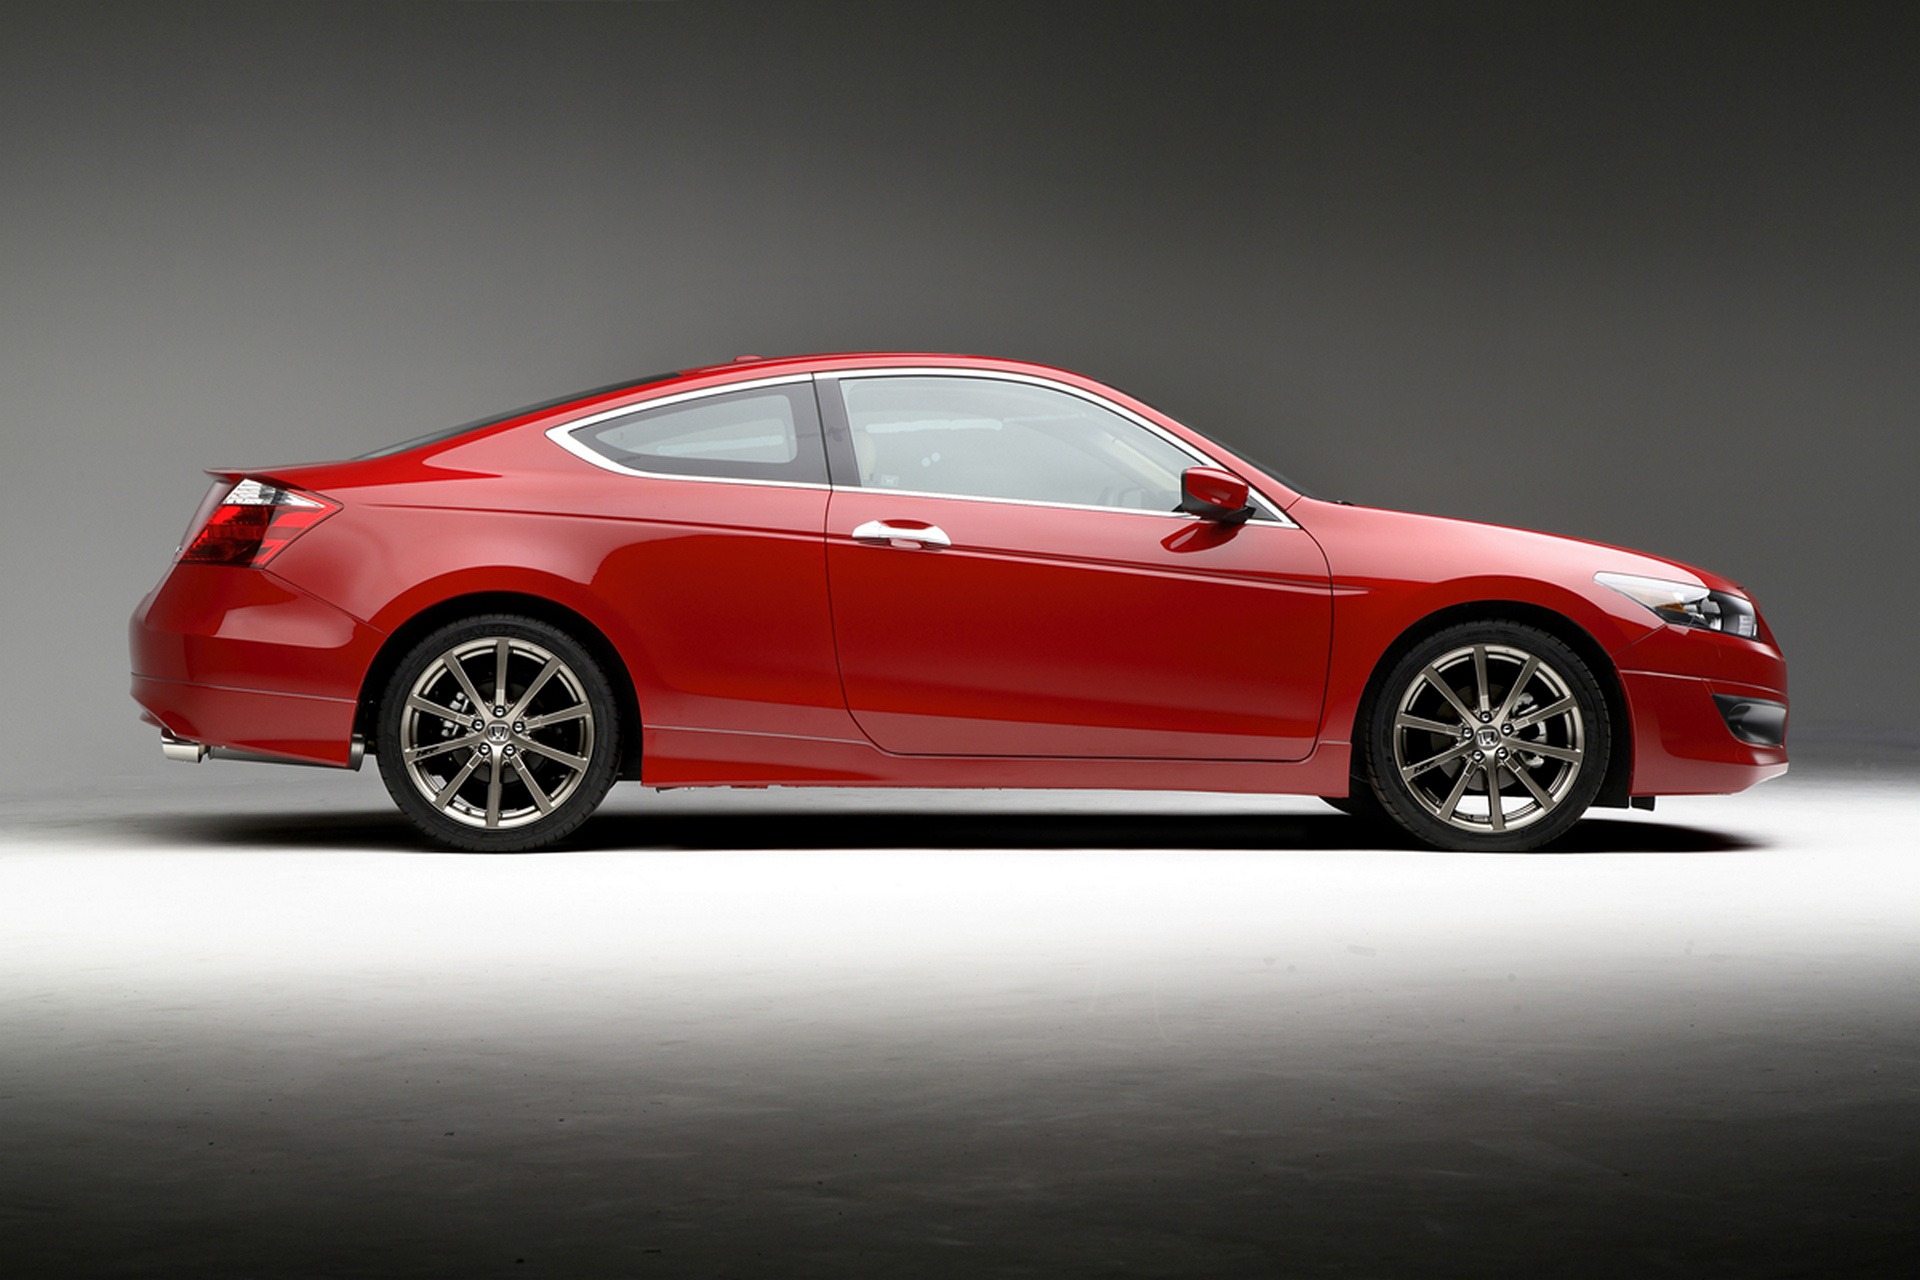 2008 Accord 8th Generation © Honda Motor Co., Ltd.